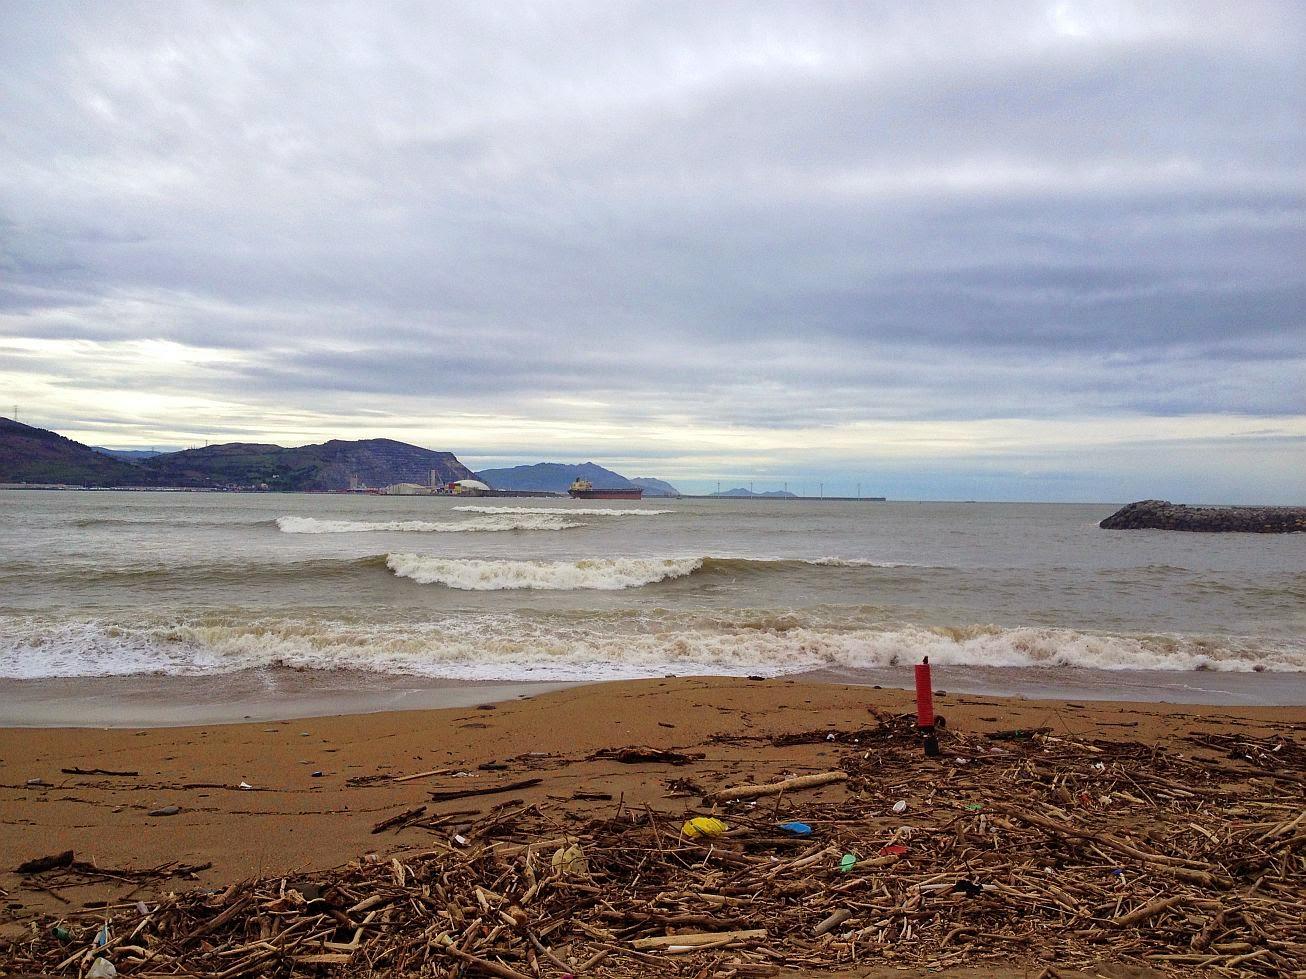 basura en la playa 02